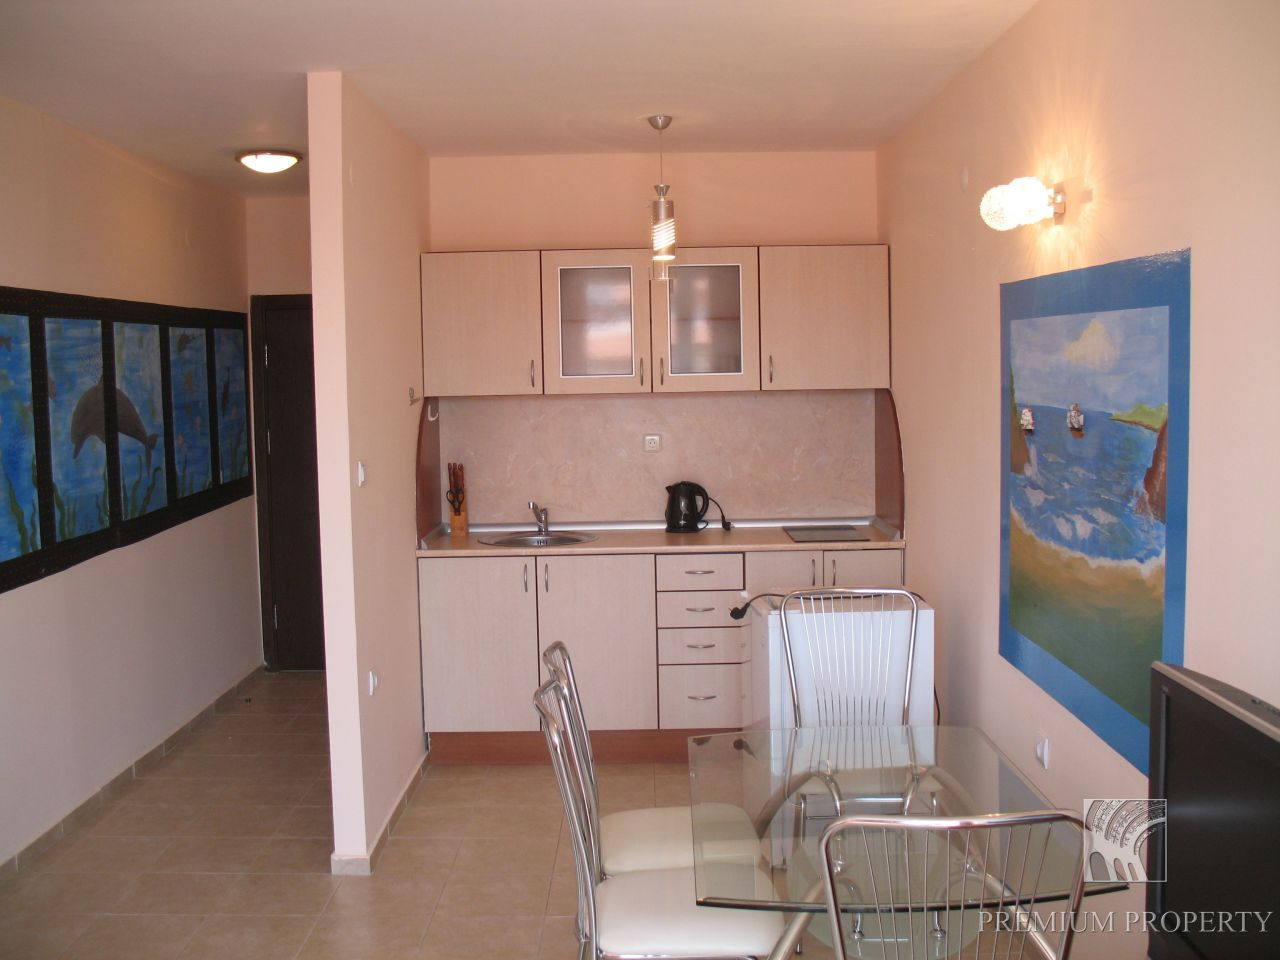 Апартаменты на Солнечном берегу, Болгария, 67 м2 - фото 1